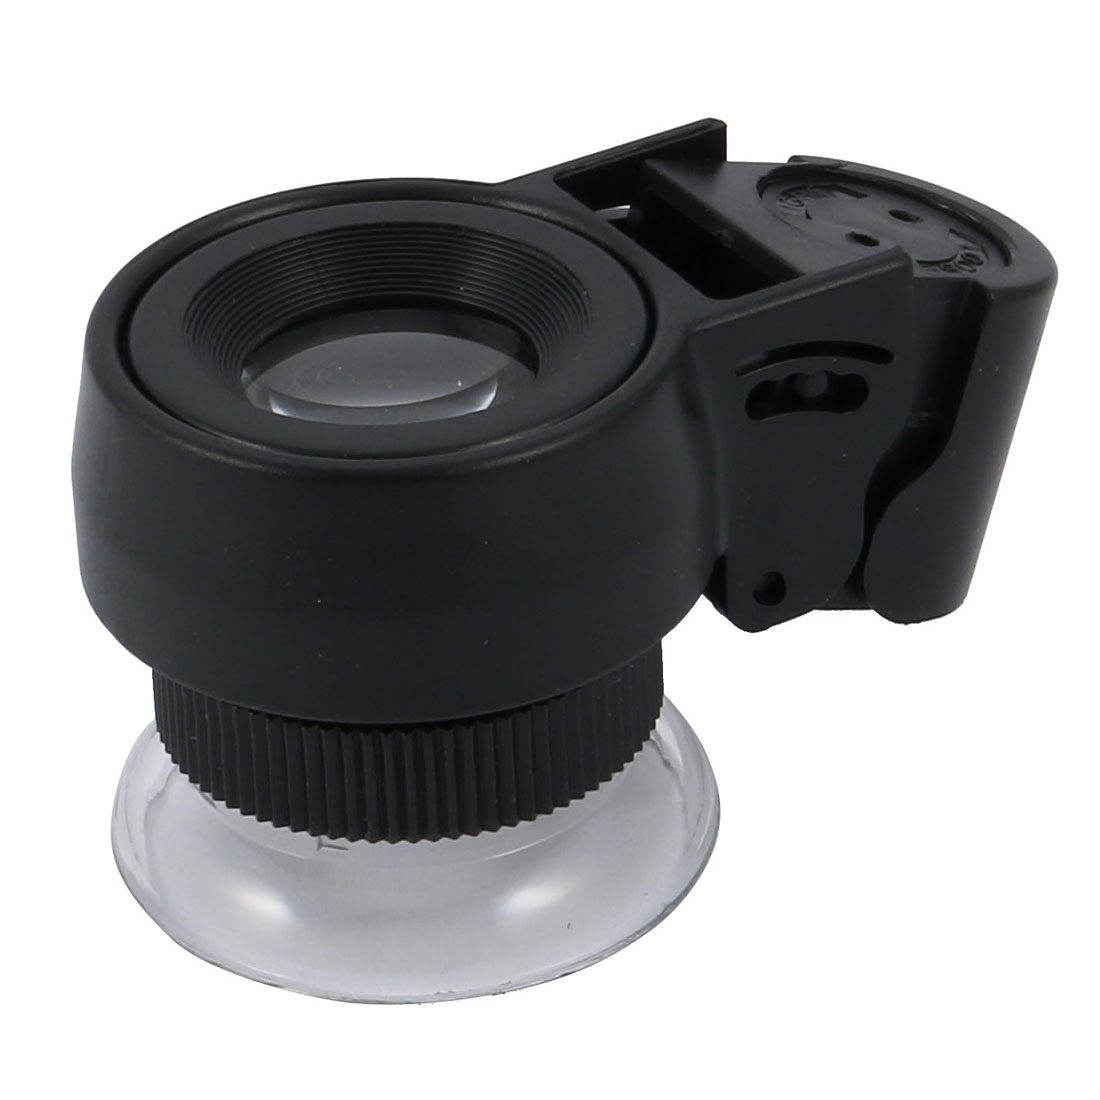 Pocket 21mm Dia 45 X Lens LED Light Jeweler Eye Loupe Magnifying Glass Black